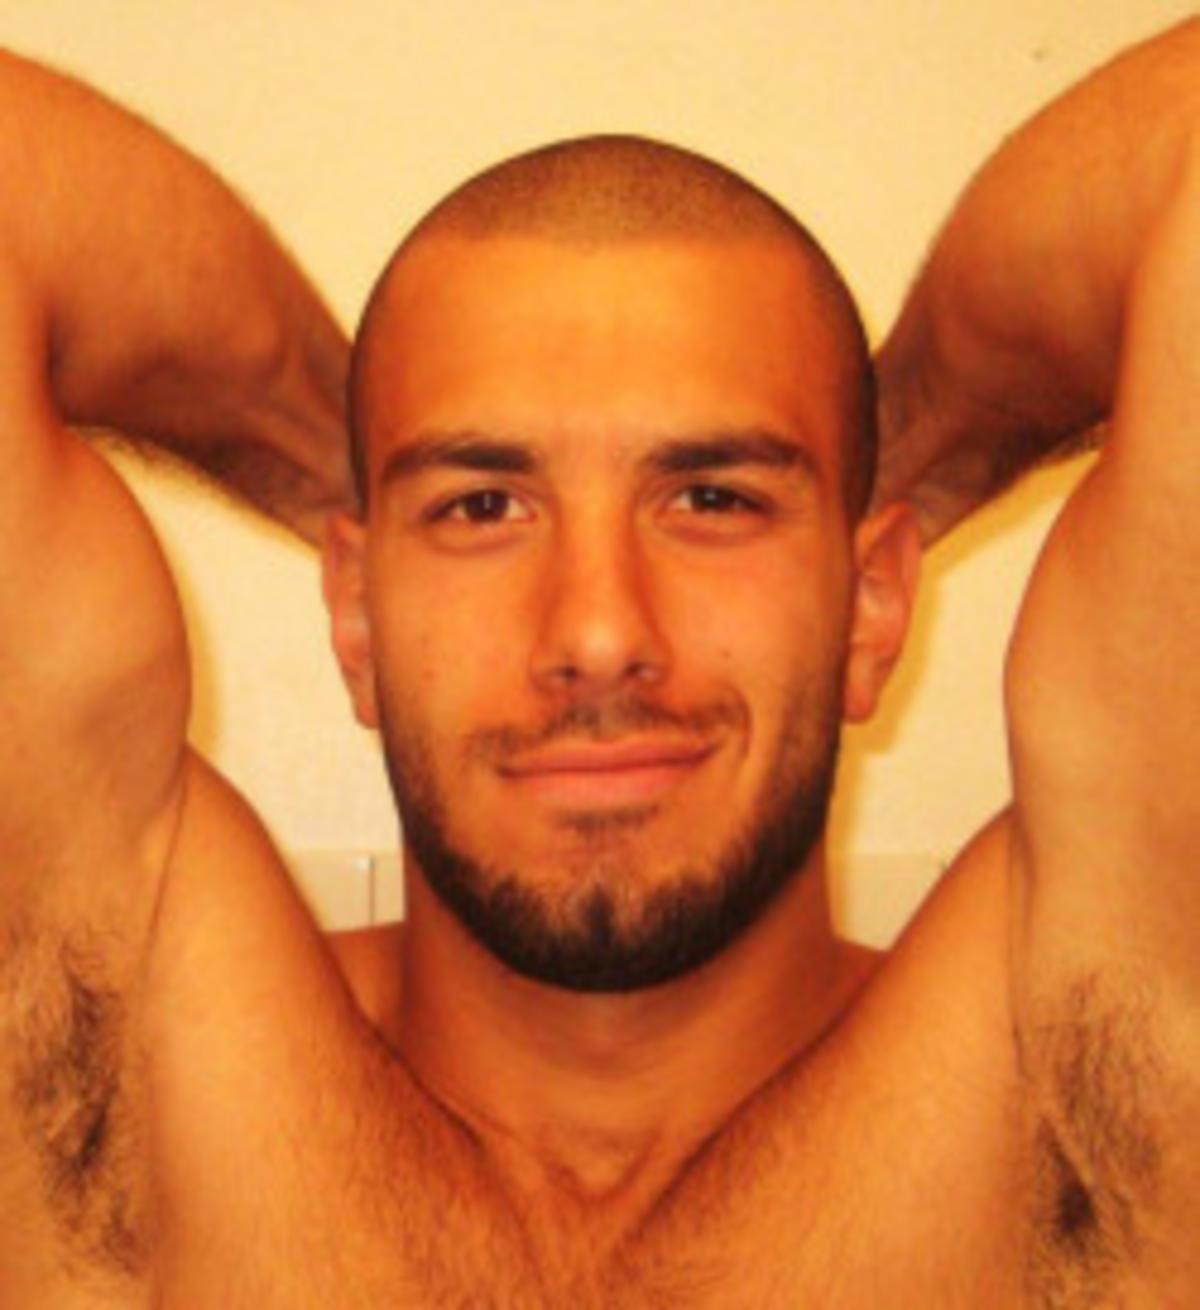 Male stripper emploment